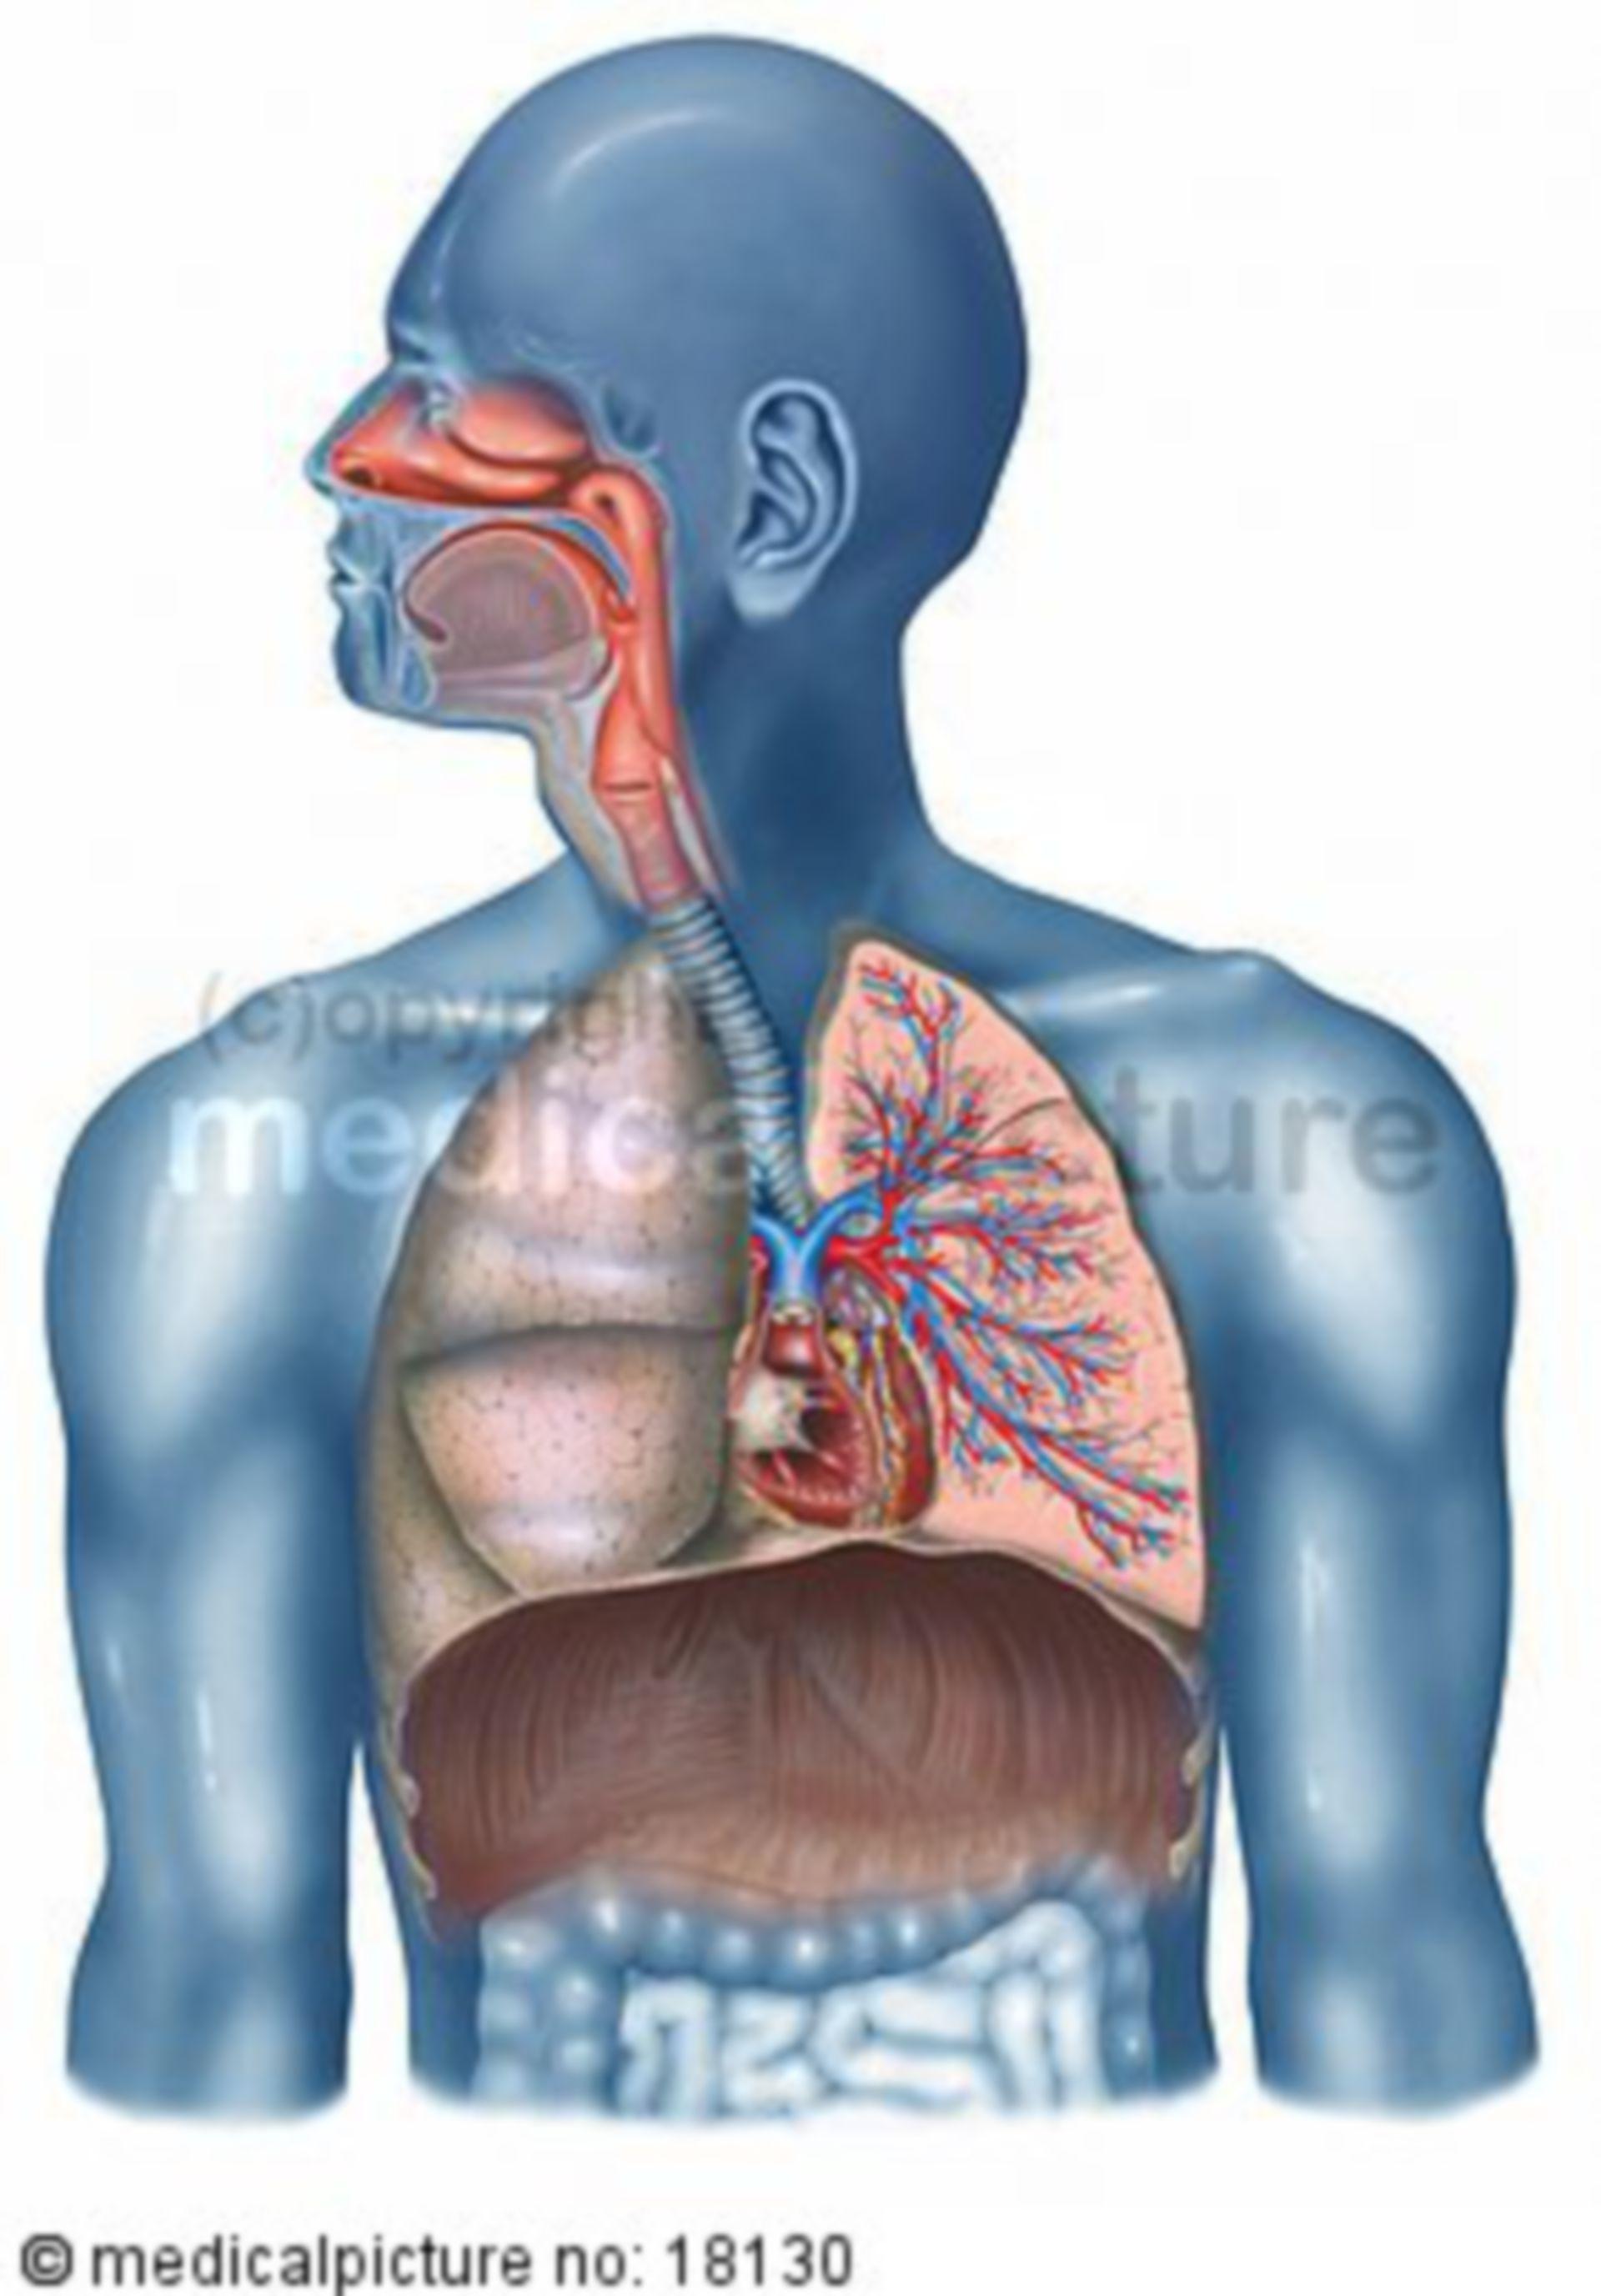 Respiratory system, airways